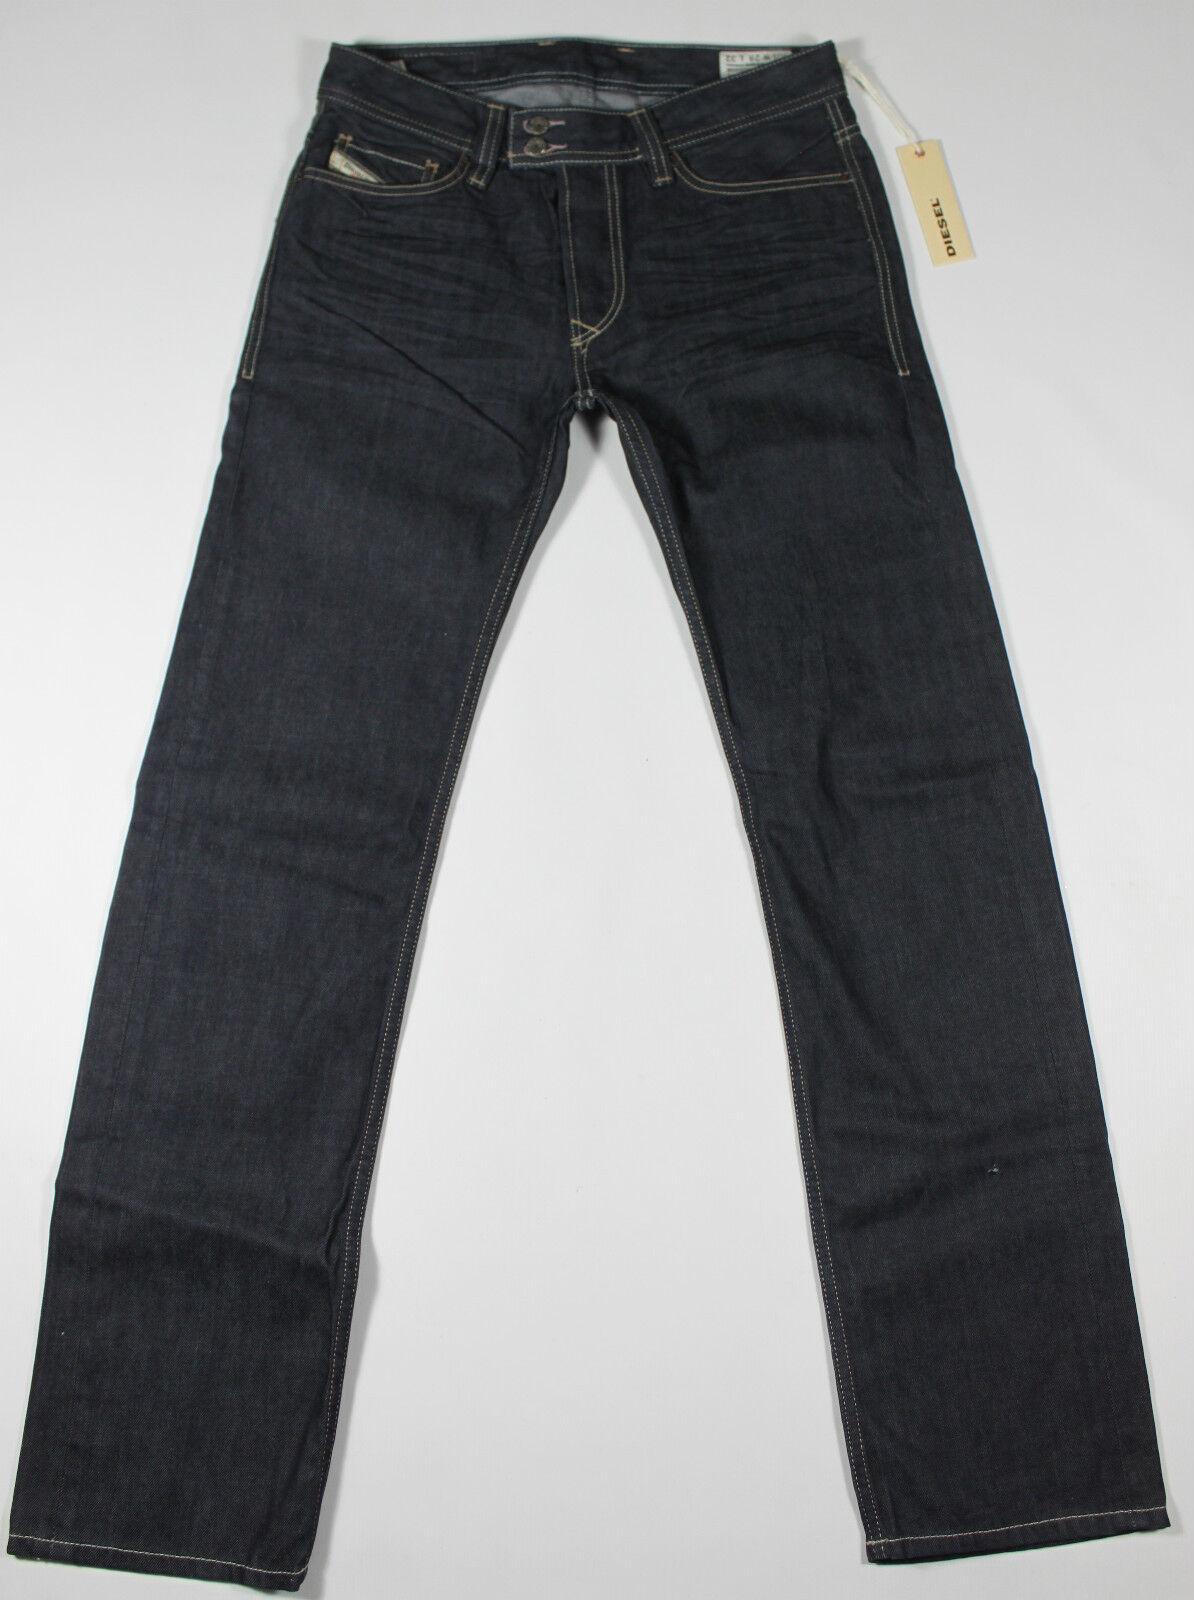 NUEVO Diesel Viker para-R-Box 88Z Jeans 28X32 0088Z Regular Fit  Straight Leg  Ahorre hasta un 70% de descuento.